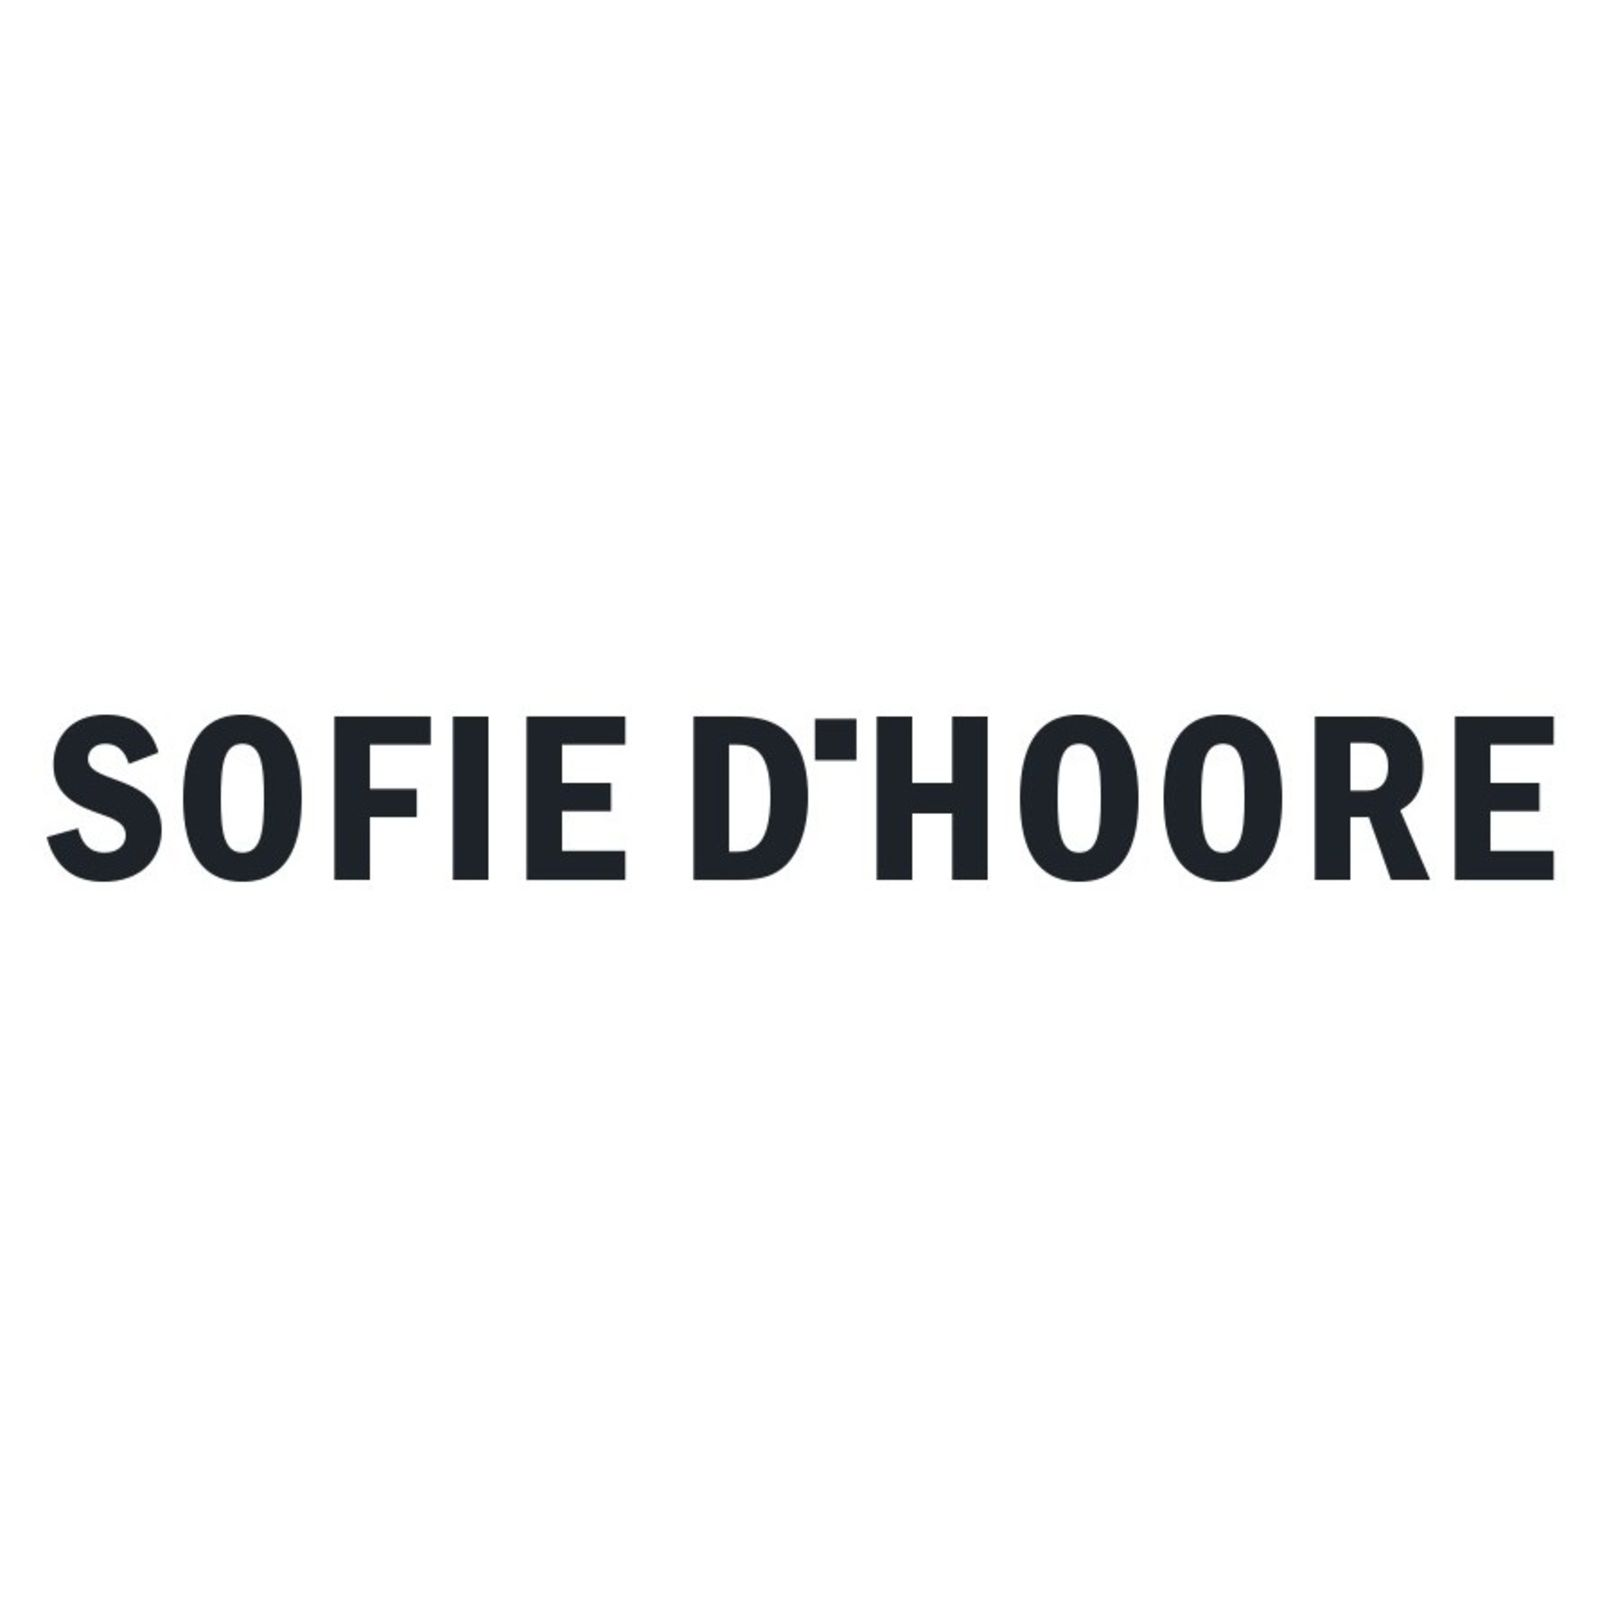 SOFIE D'HOORE